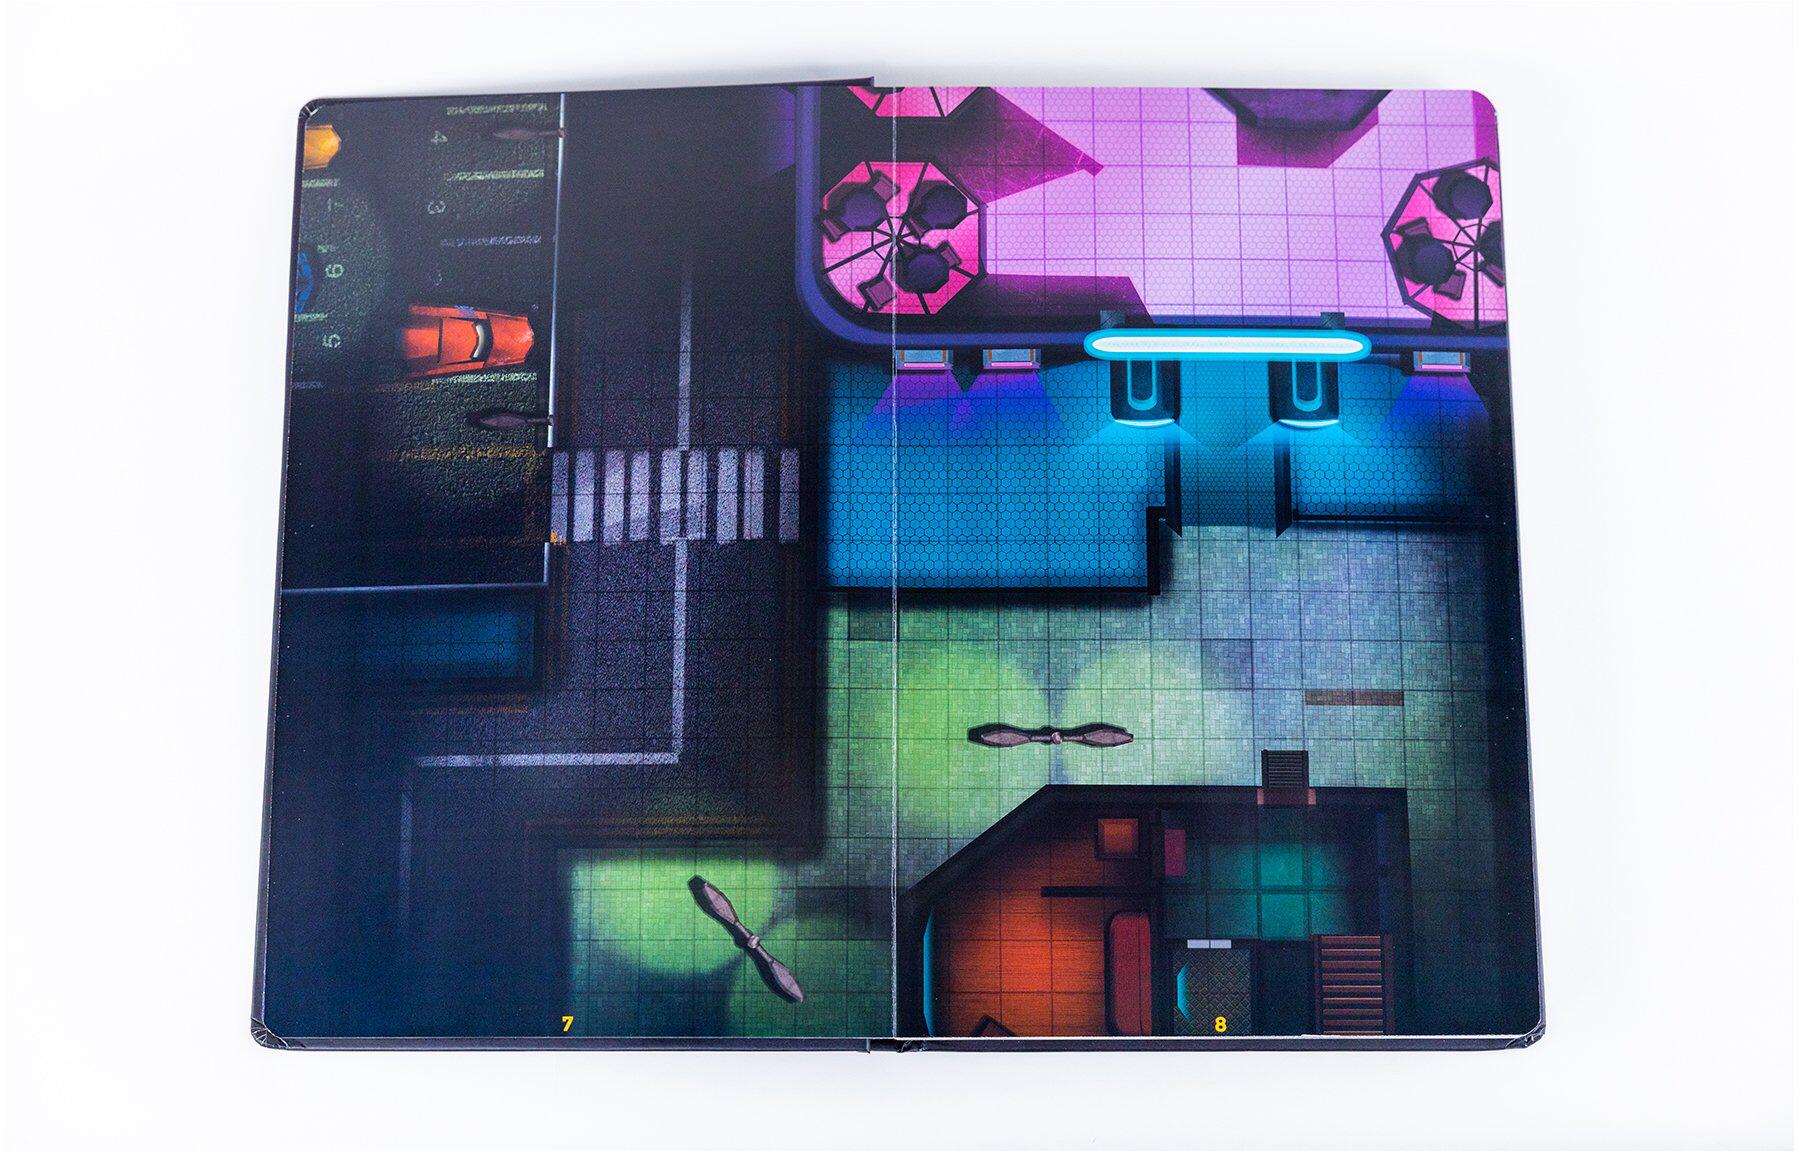 Yarn studio Immersive Battle Maps 2 Book